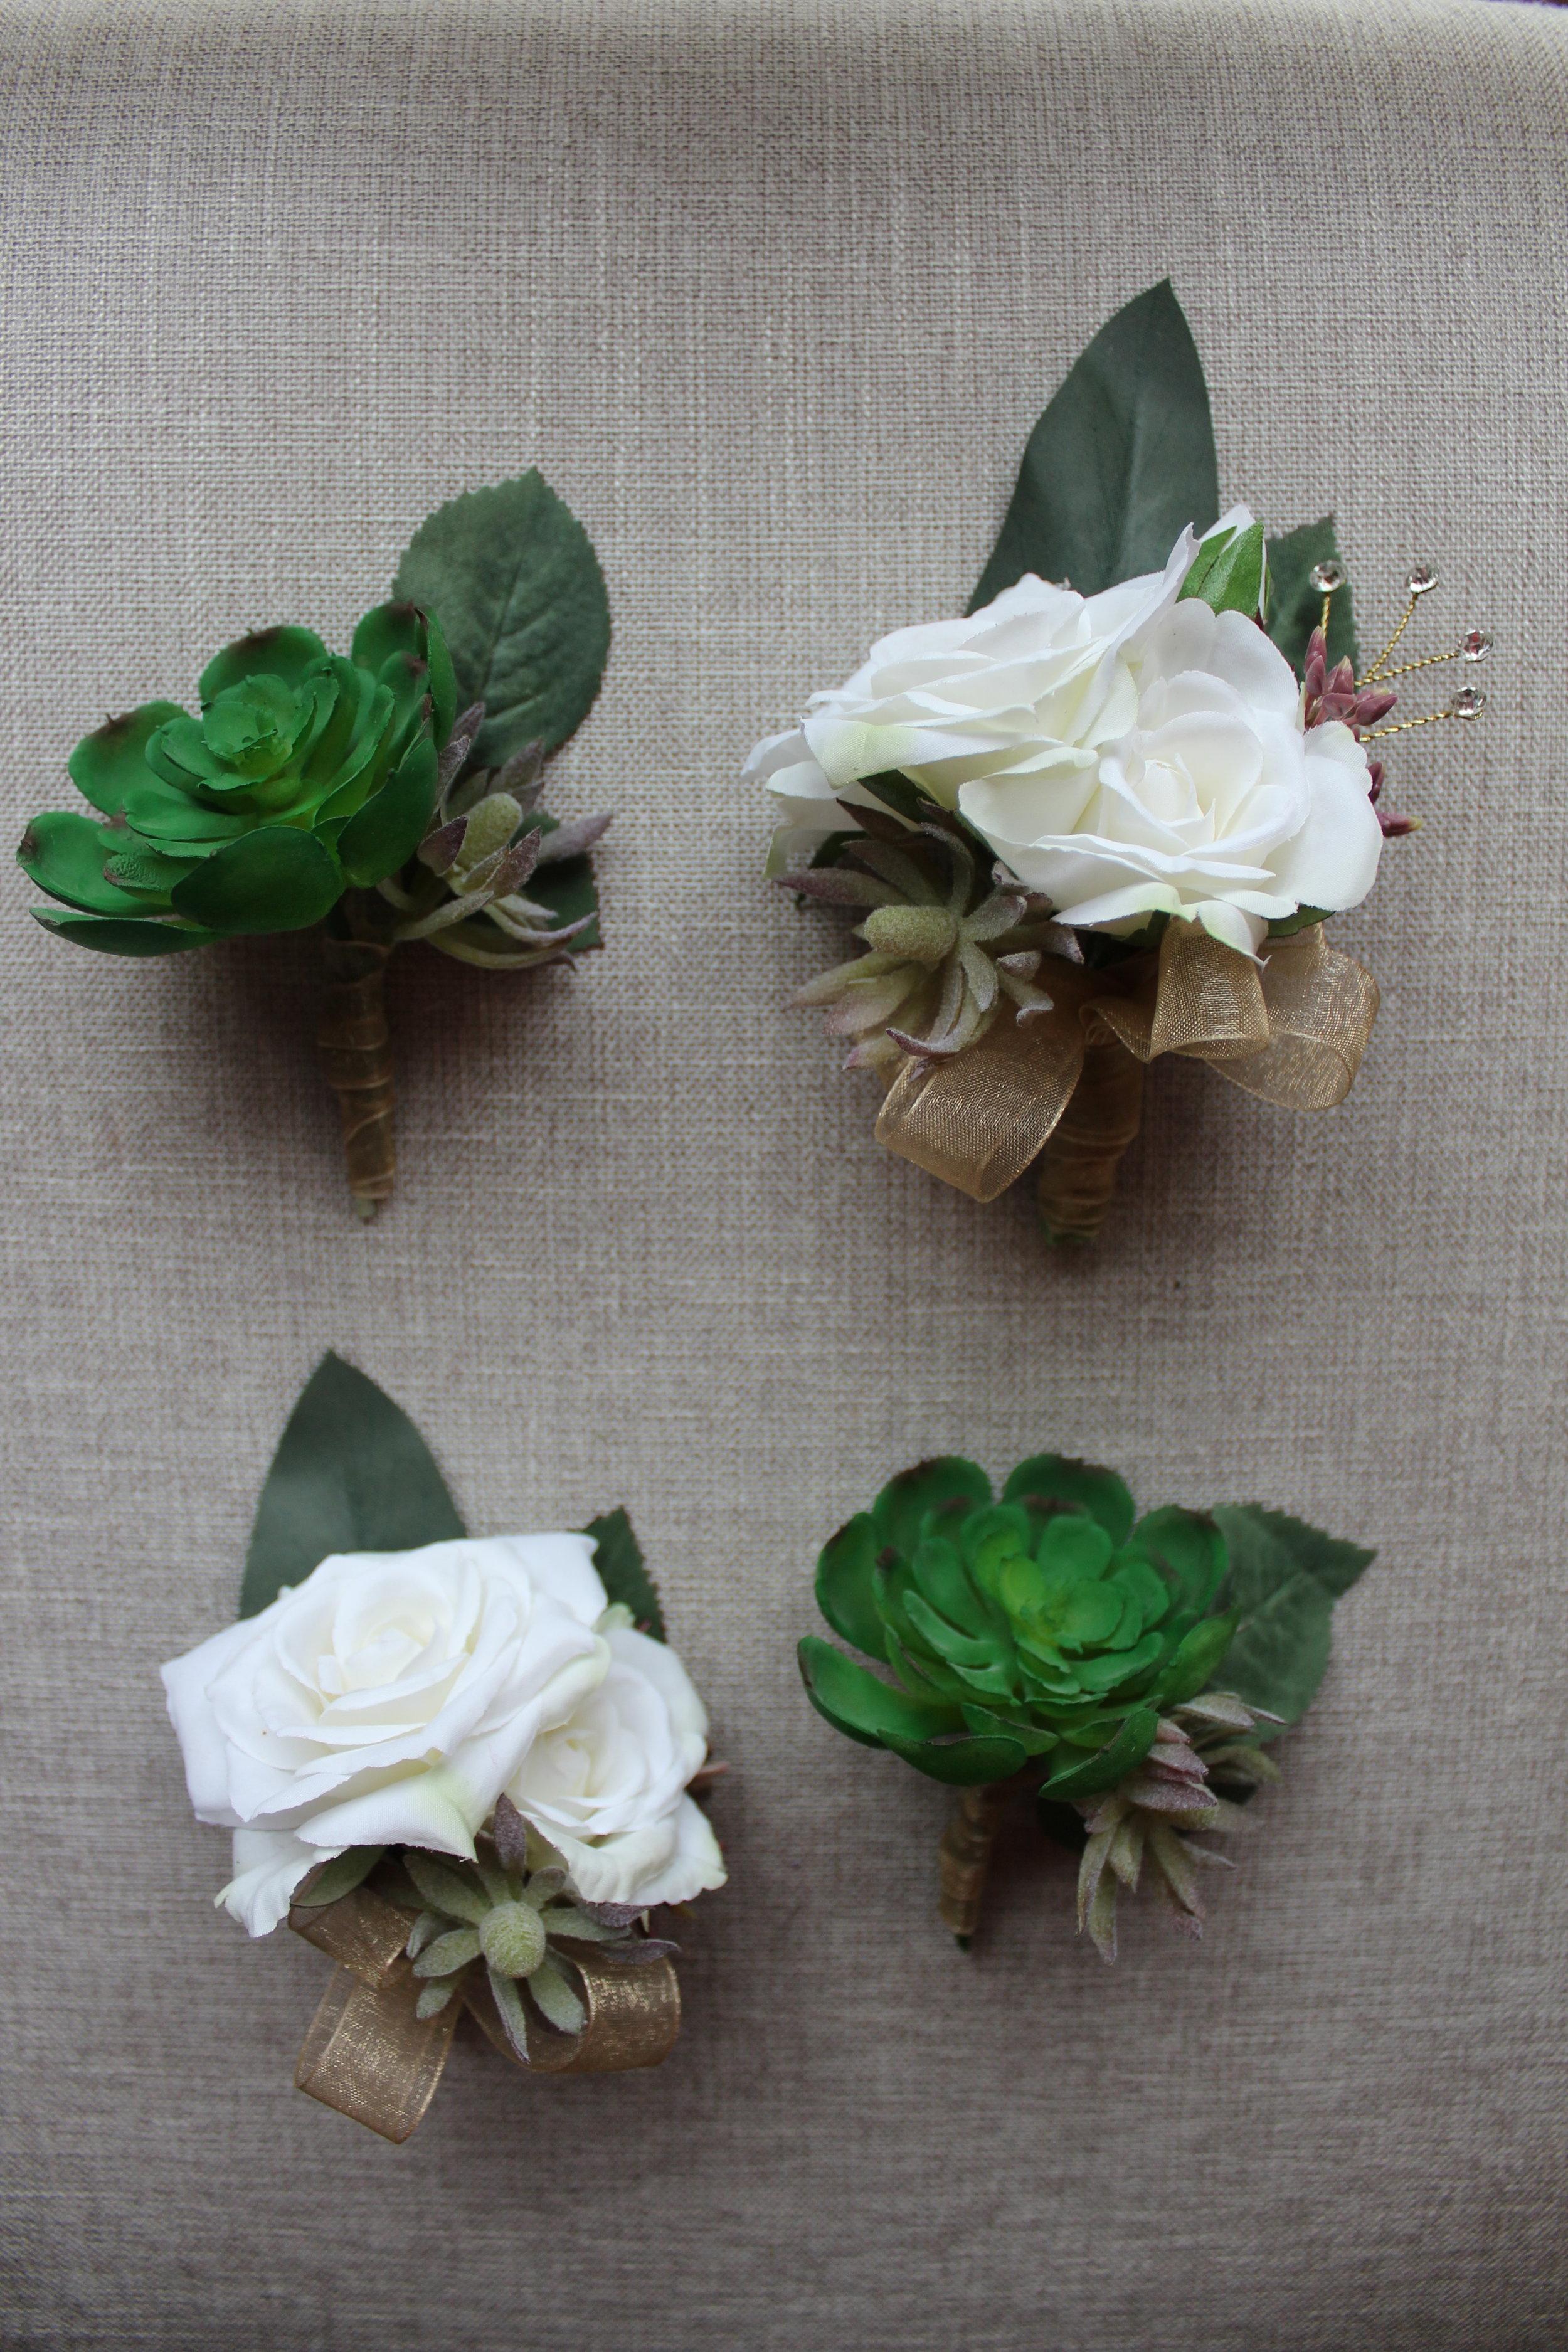 silk-wedding-flowers-bridal-bridesmaid-bouquets-boutonnieres.jpg